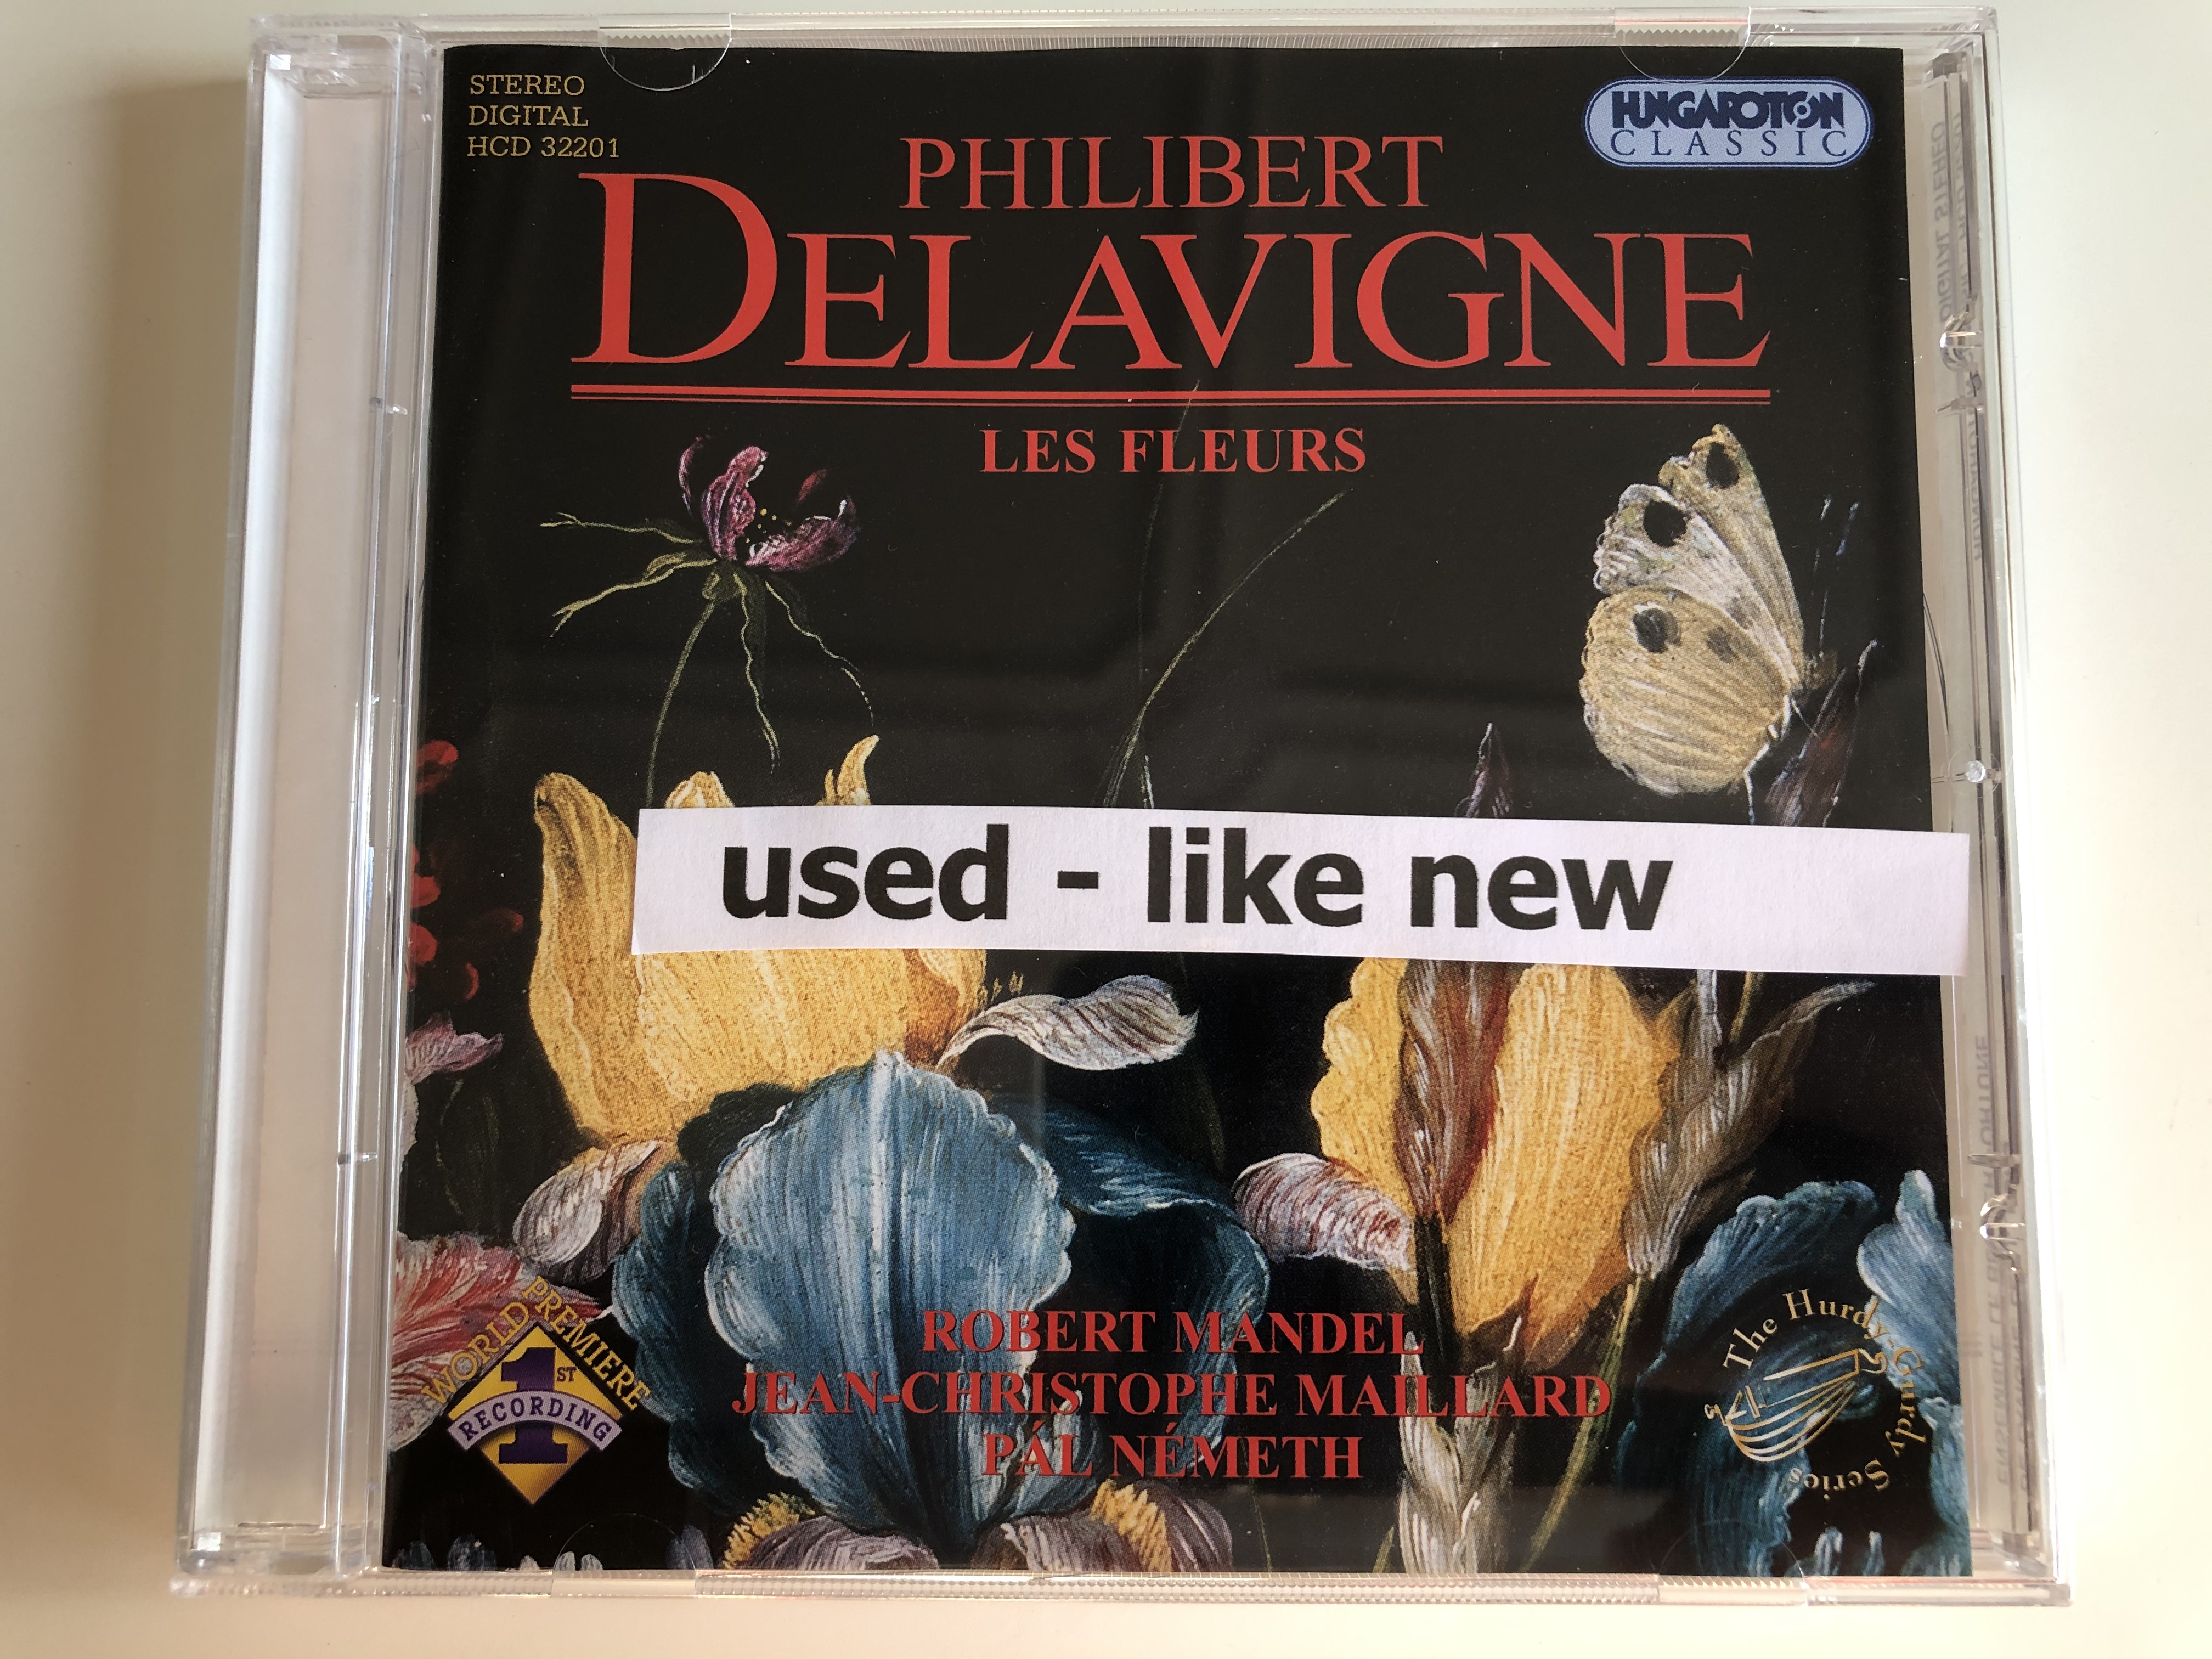 philibert-delavigne-les-fleurs-robert-mandel-jean-christophe-maillard-pal-nemeth-hungaroton-classic-audio-cd-2005-stereo-hcd-32201-9-.jpg